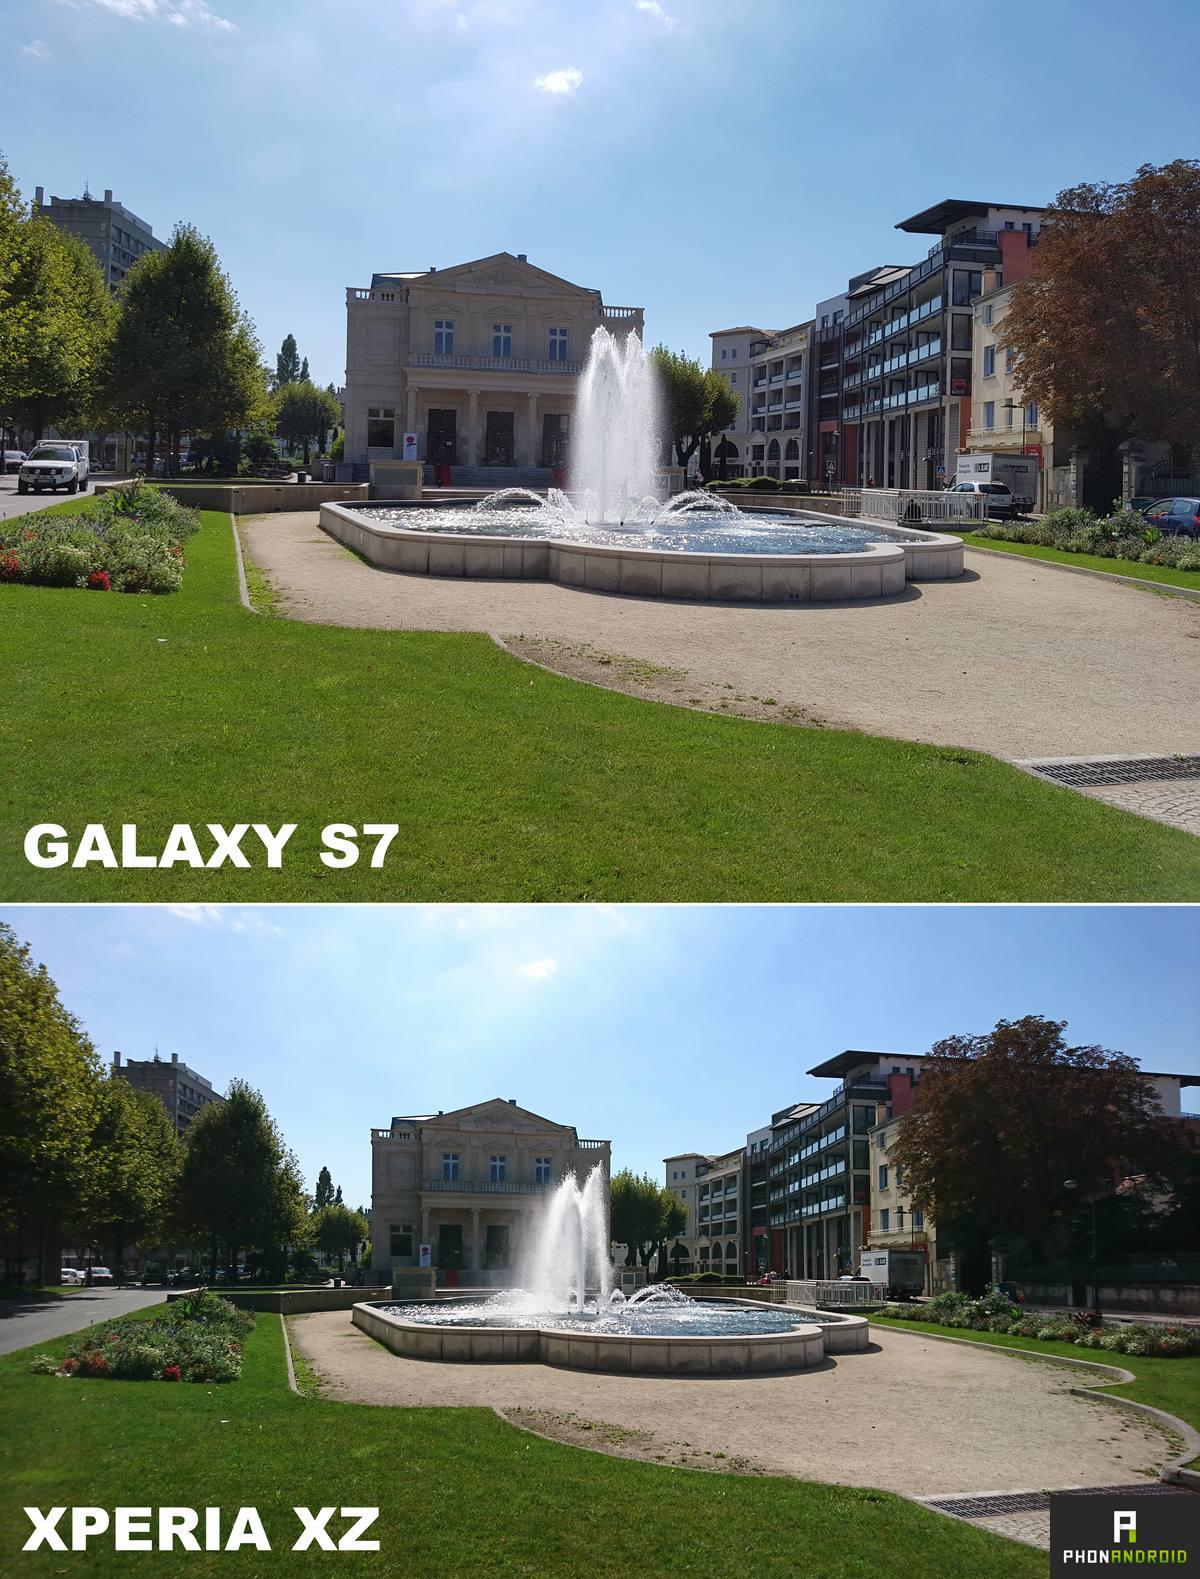 comparatif-photo-sony-xperia-xz-galaxy-s7